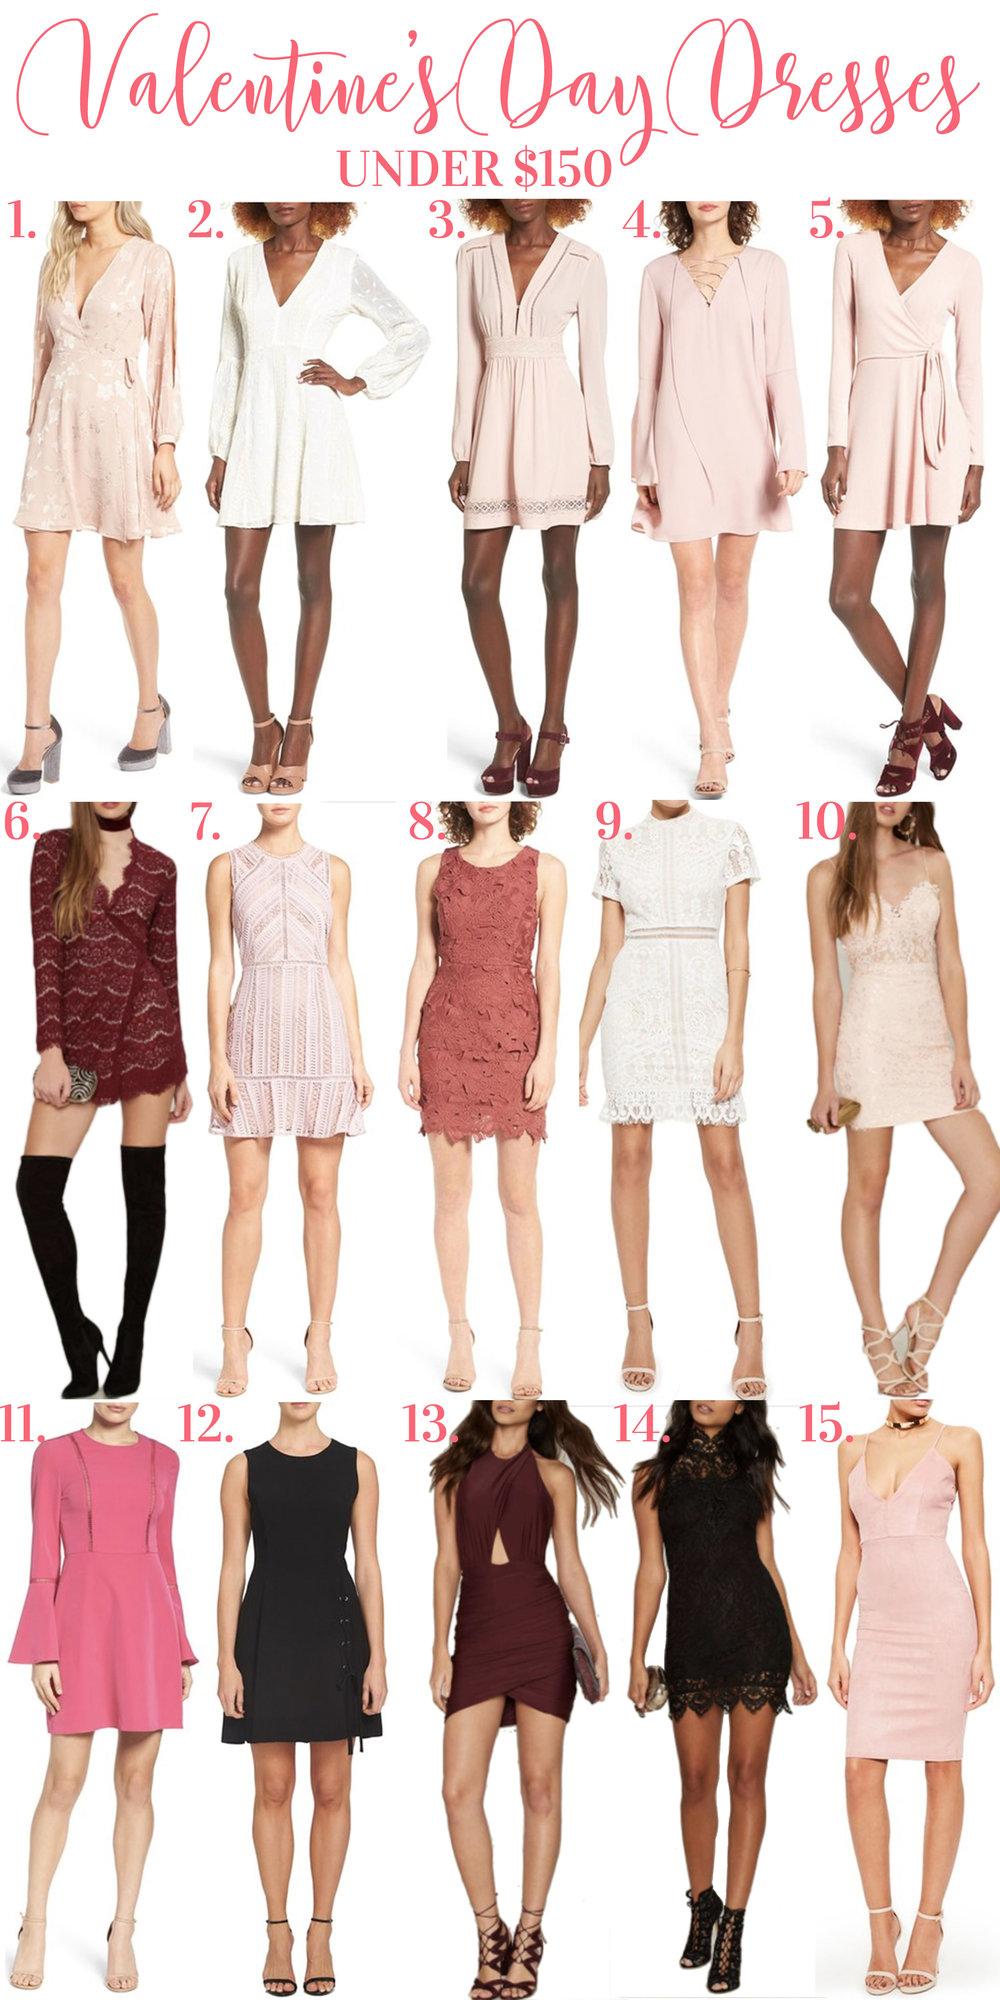 15 VALENTINE'S DAY DRESSES UNDER $150 — Me and Mr. Jones